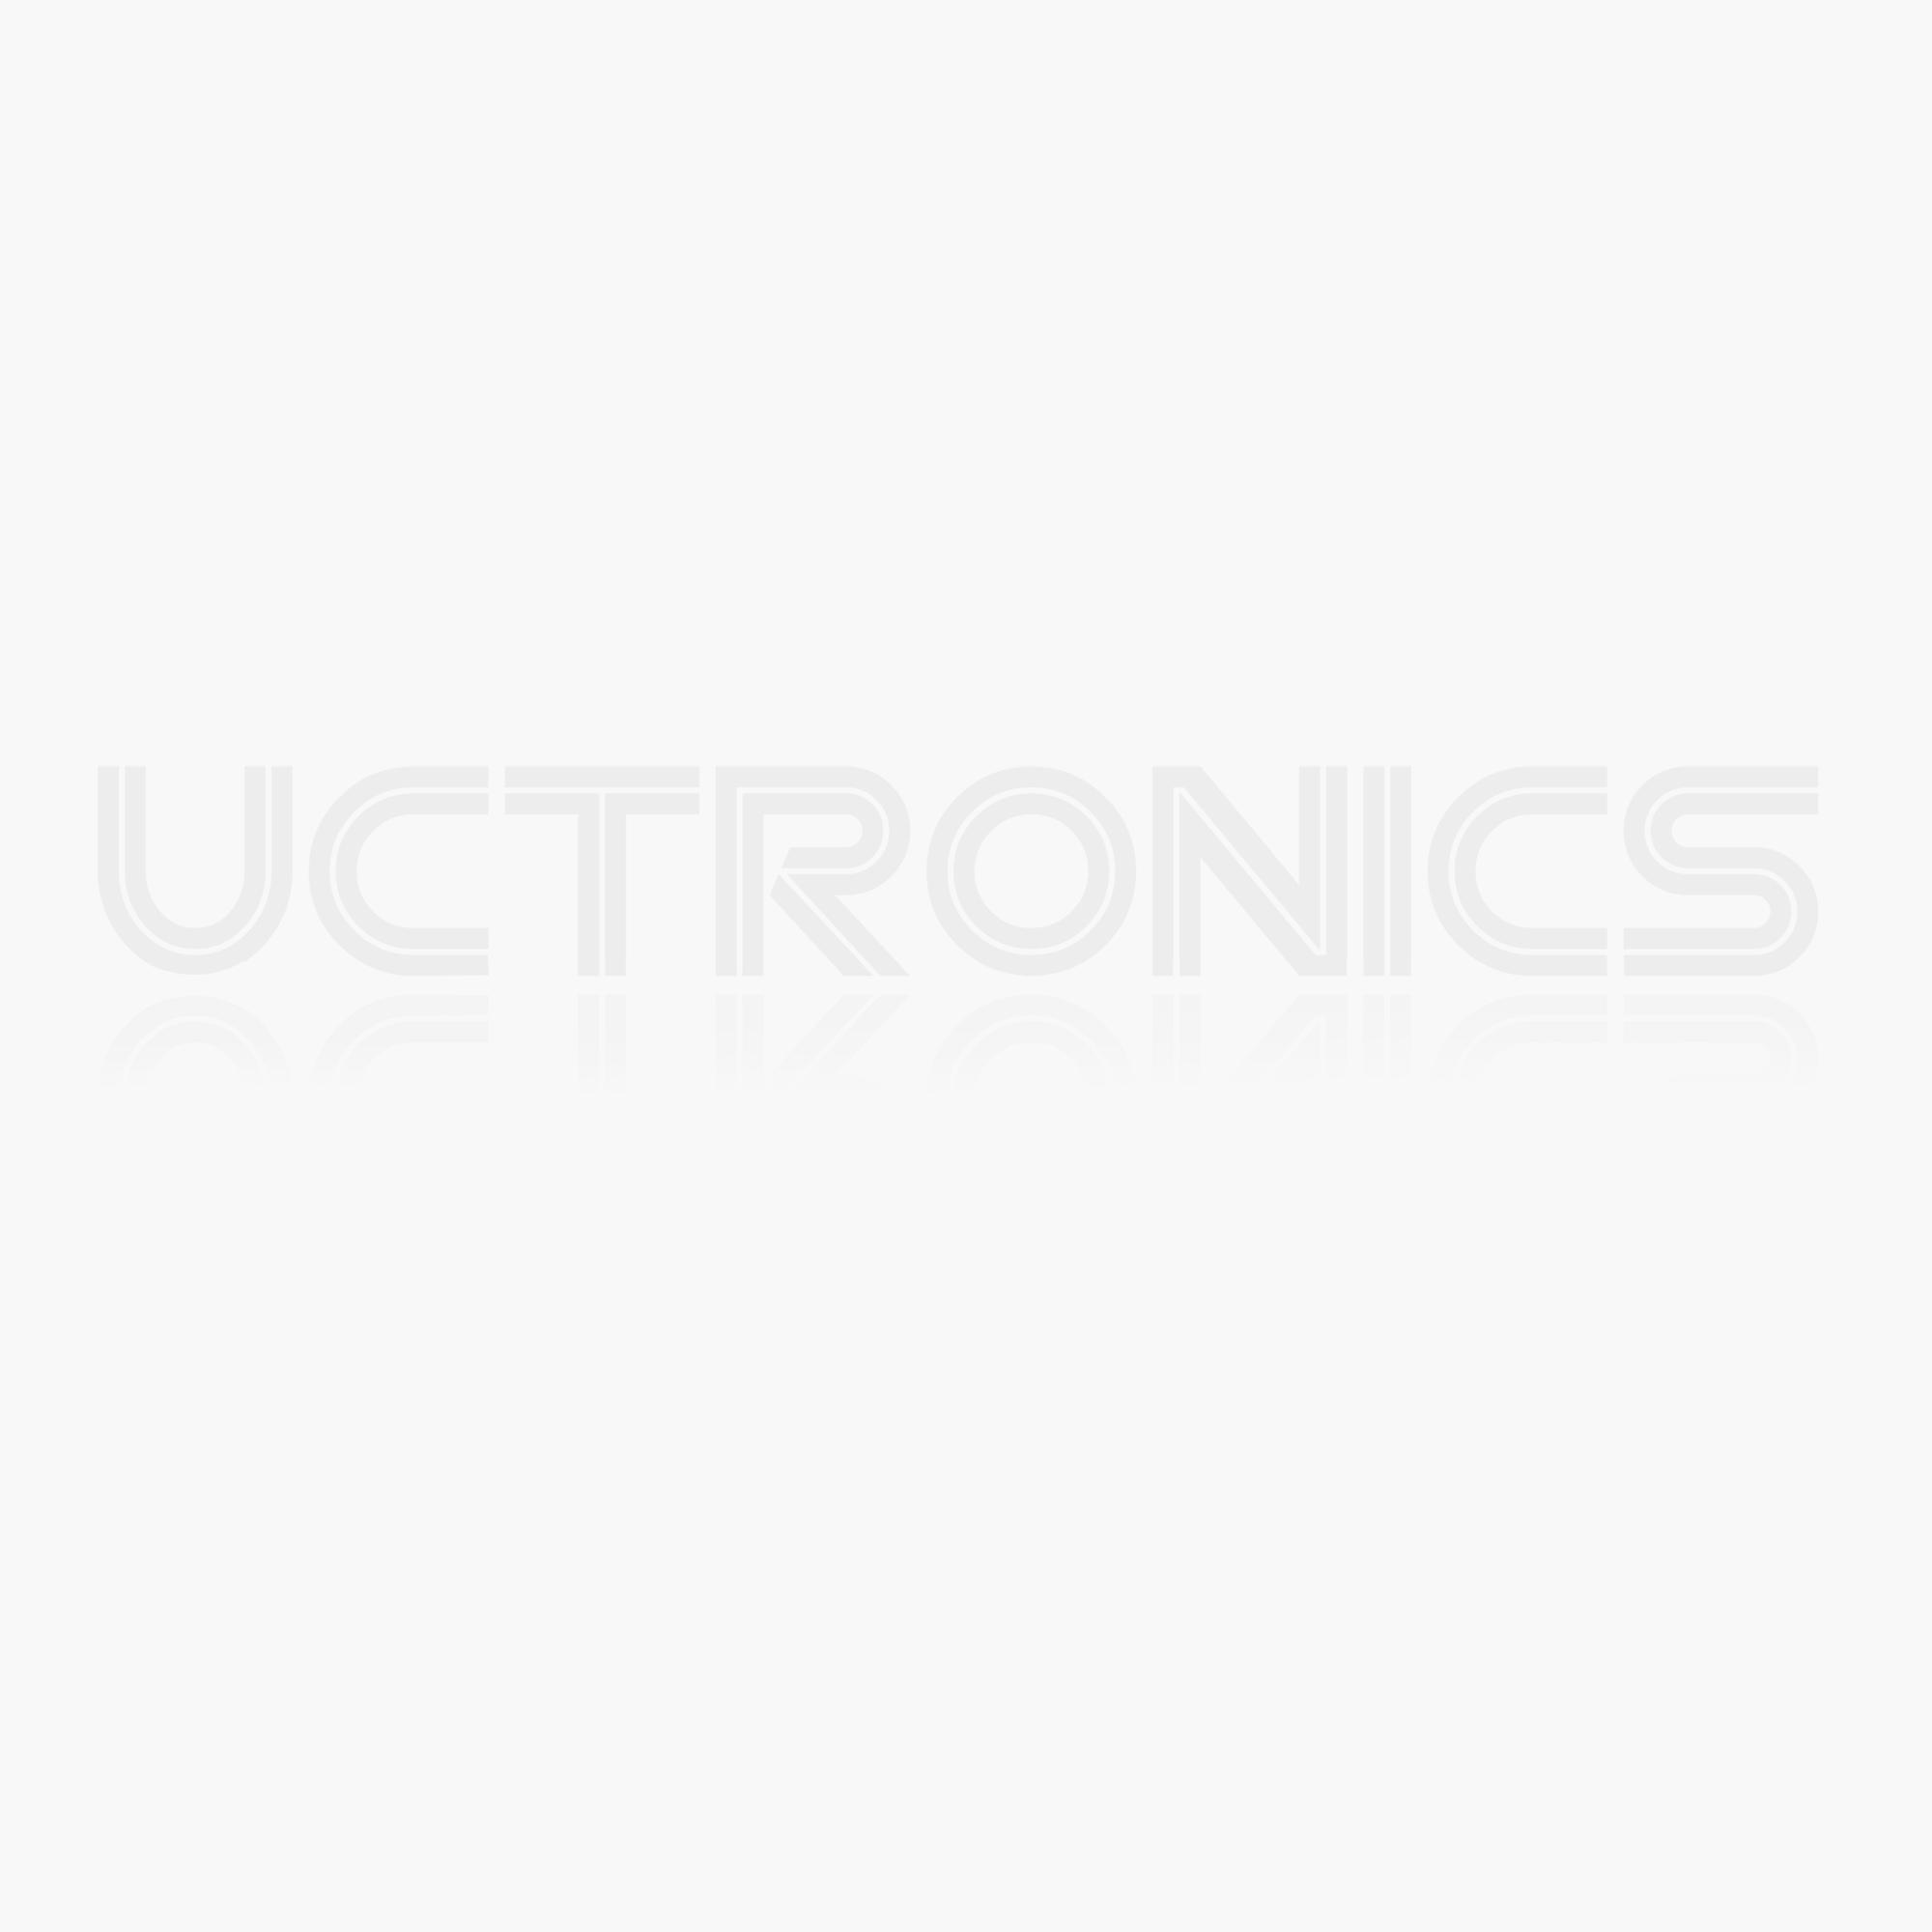 10pcs TJC8-4P 4pin Dupont Header Straight Pin Locking Socket 2.54mm Pitch